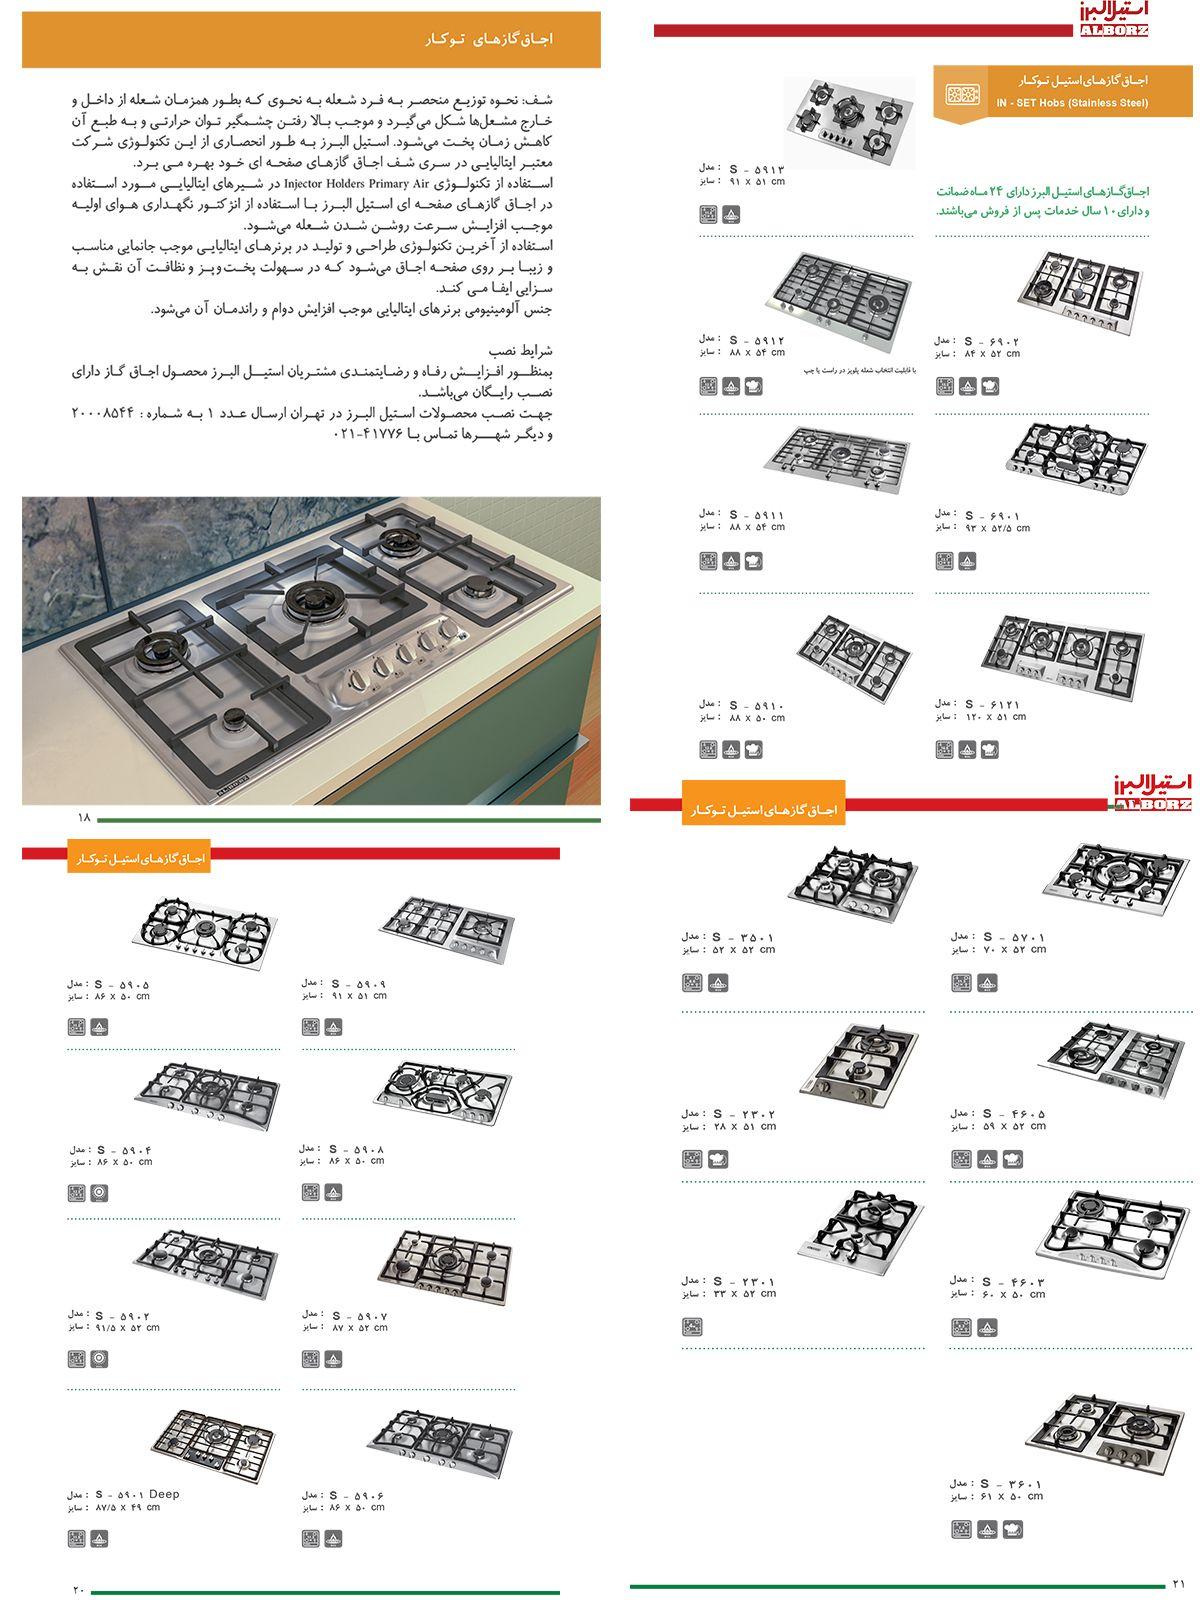 کاتالوگ گاز استیل البرز